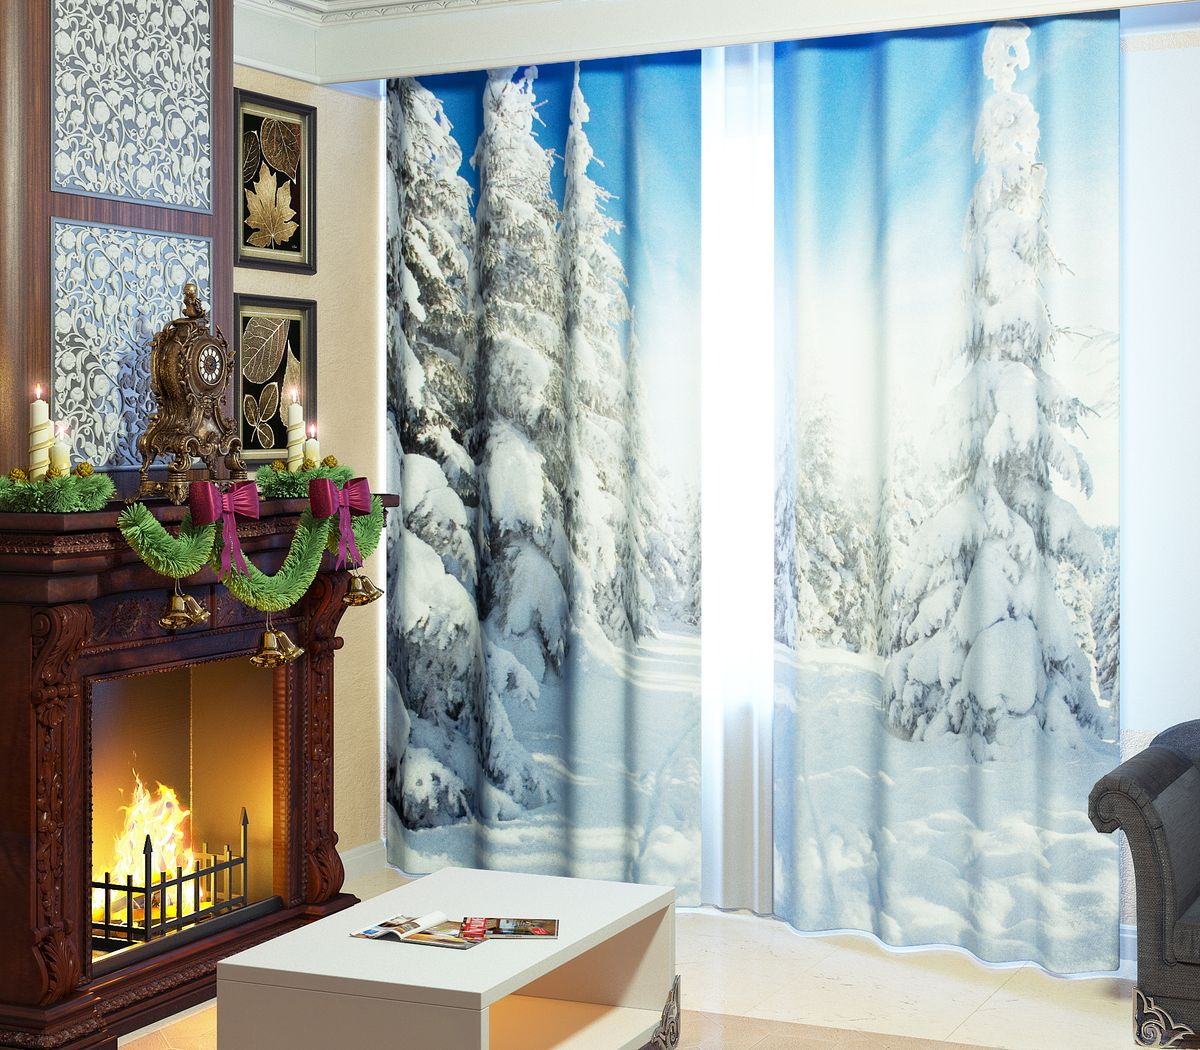 Комплект фотоштор Сирень Зимний лес, на ленте, высота 260 см комплект фотоштор сирень водопад для двоих на ленте высота 260 см 03747 фш бл 001